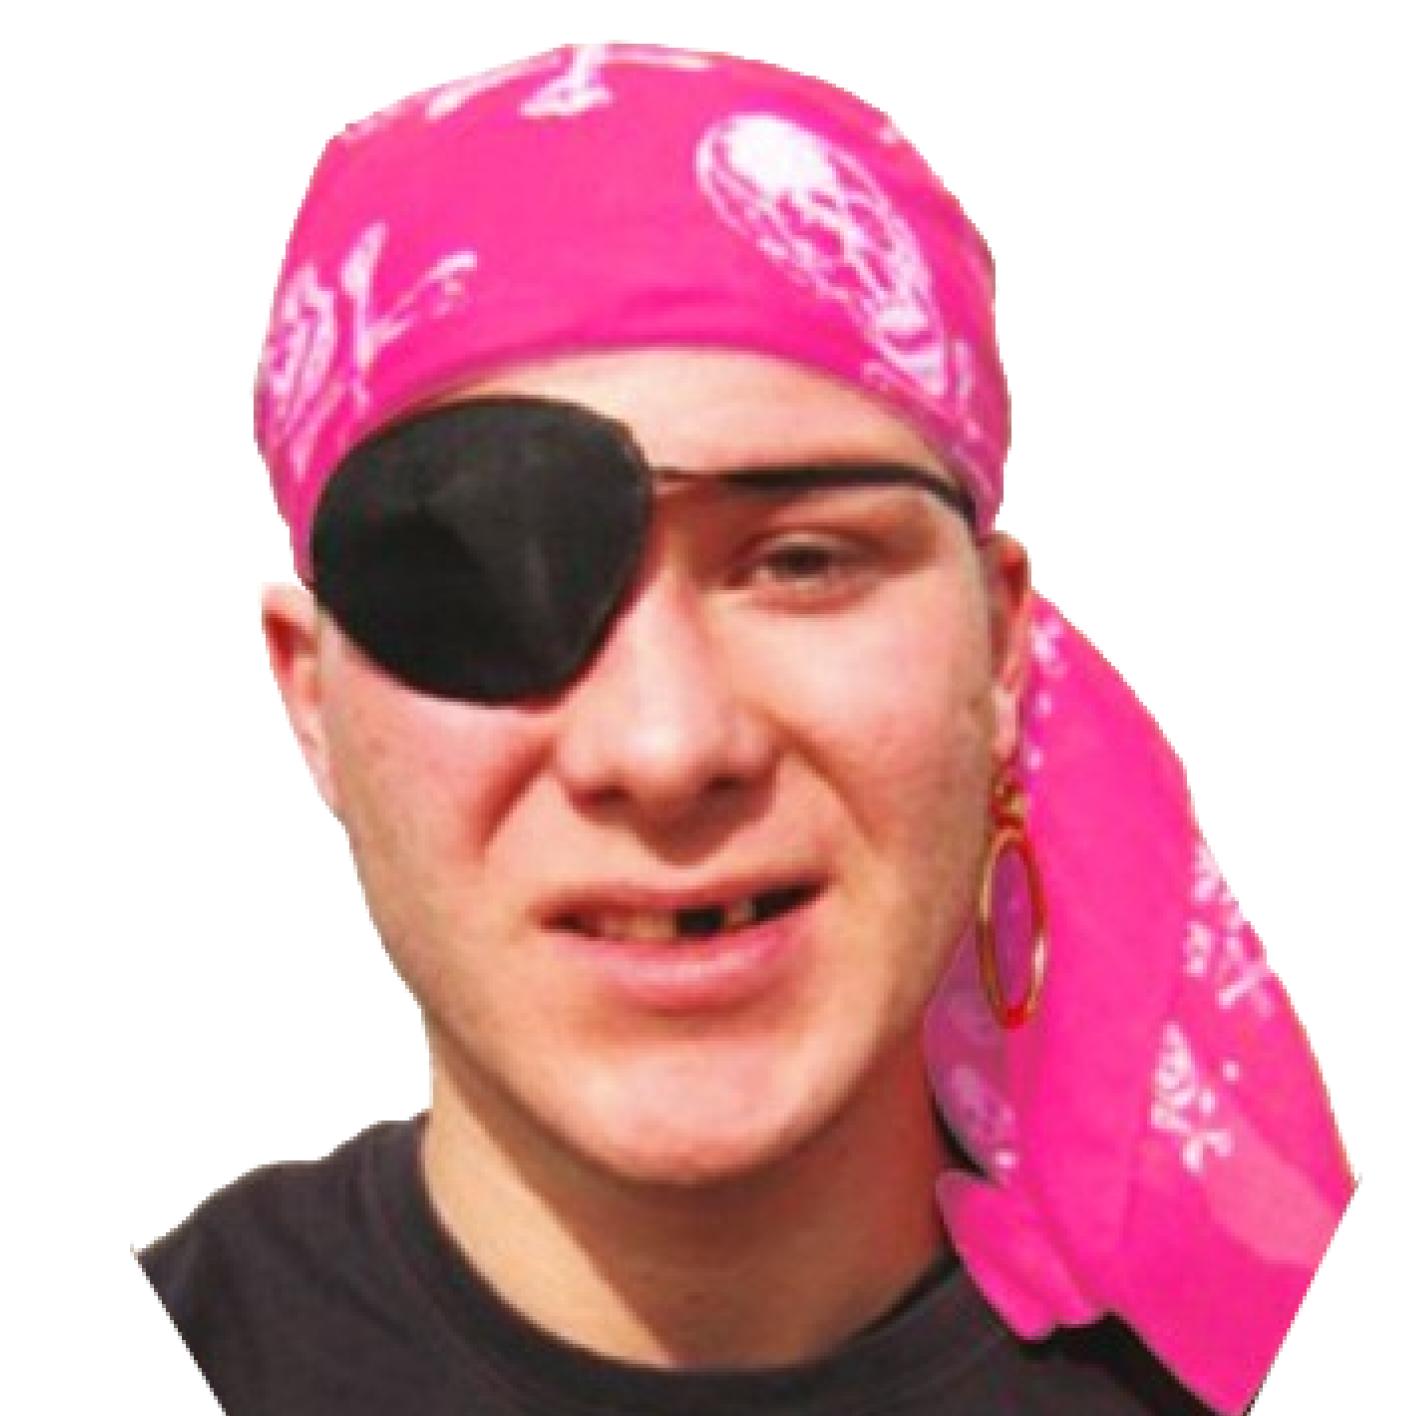 Zakdoek - Roze - Bandana - Piraat